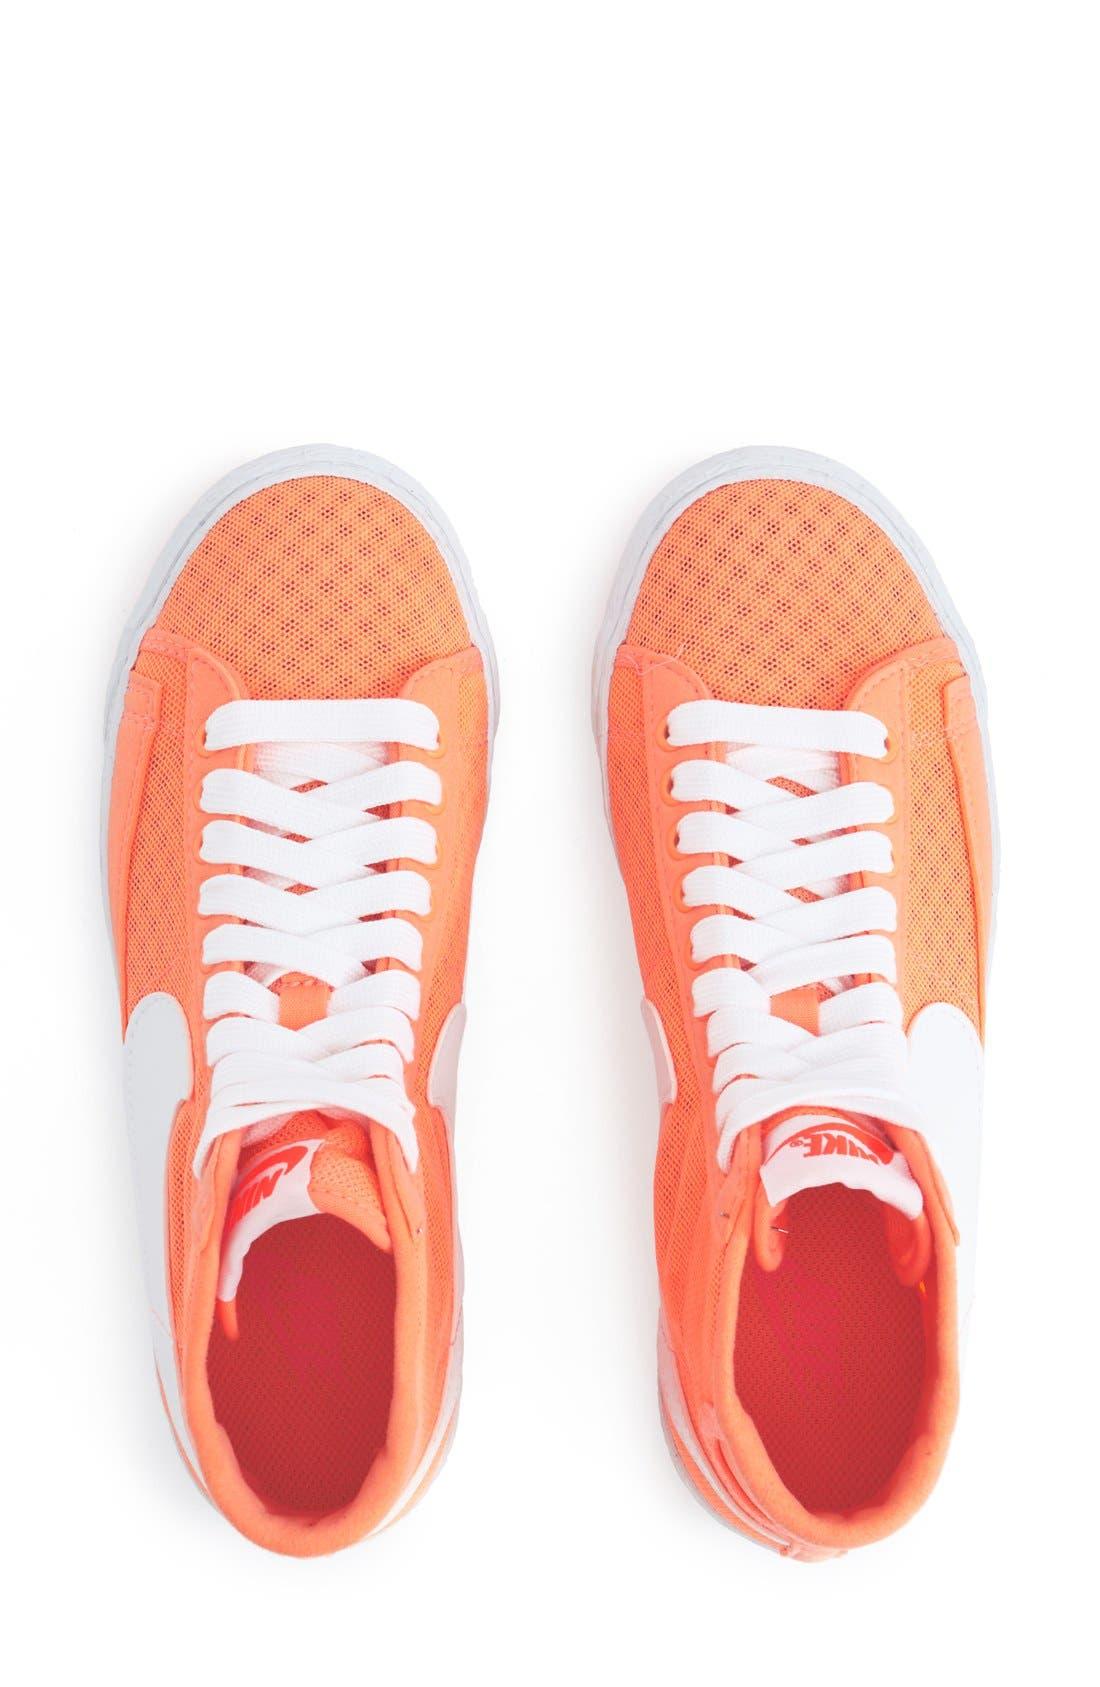 Alternate Image 3  - Nike 'Blazer' Vintage High Top Mesh Sneaker (Women)